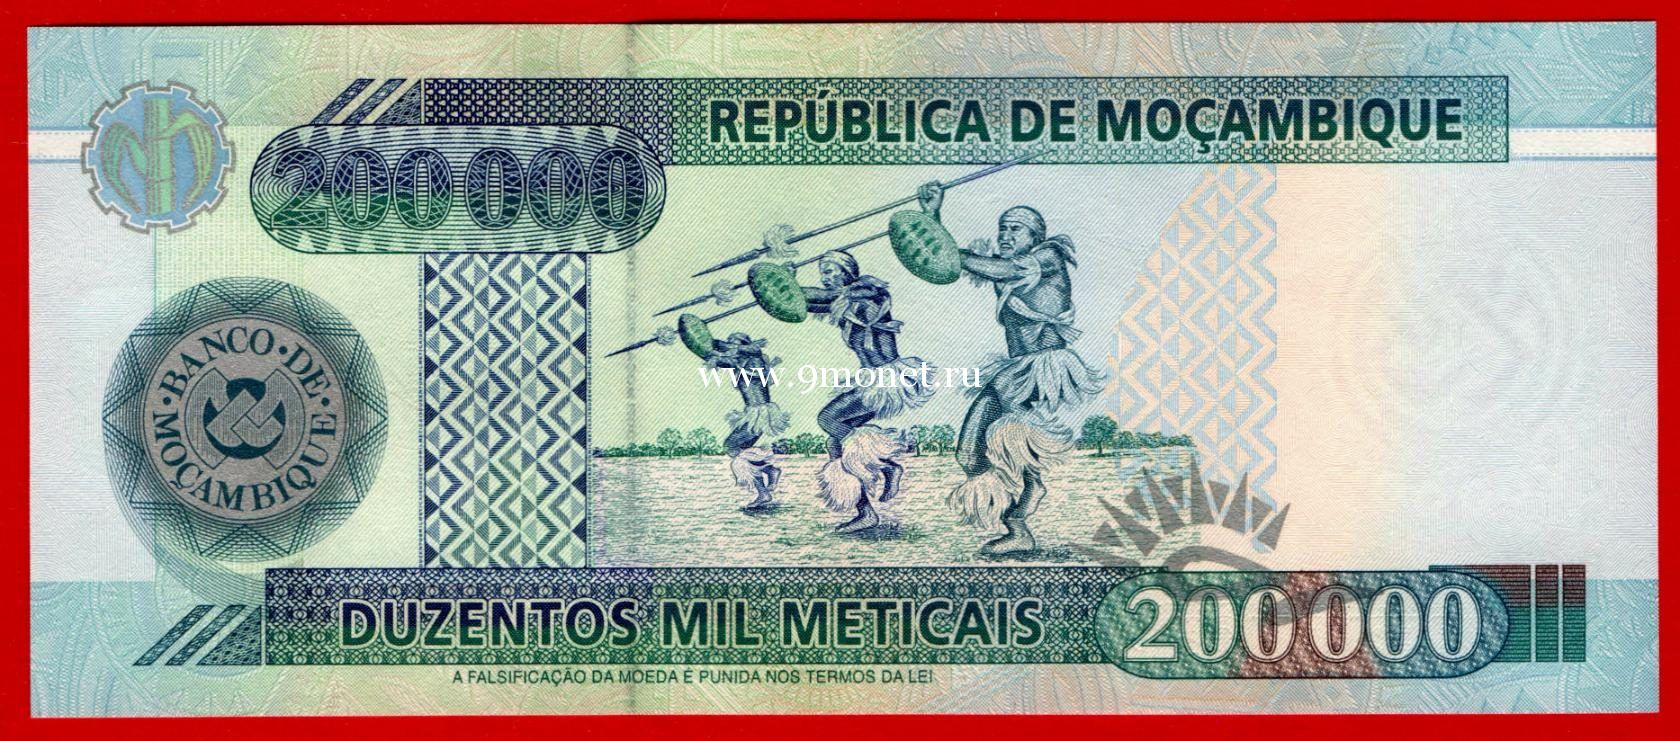 2003 год. Мозамбик. Банкнота 200000 мекиталь.